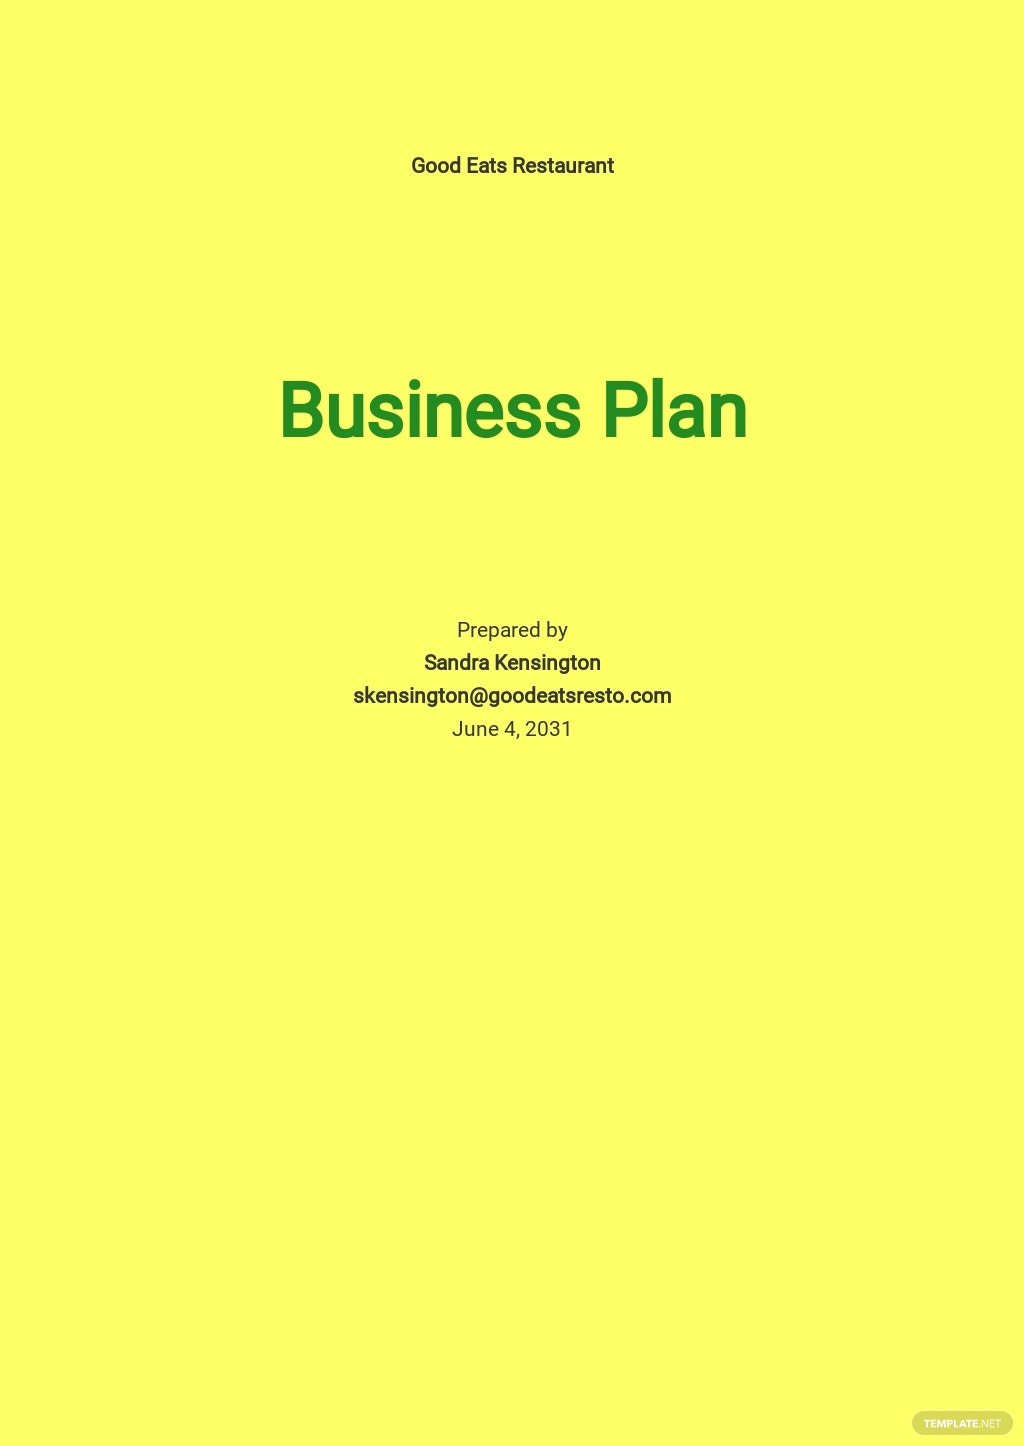 Restaurant Business Plan for Investors Template